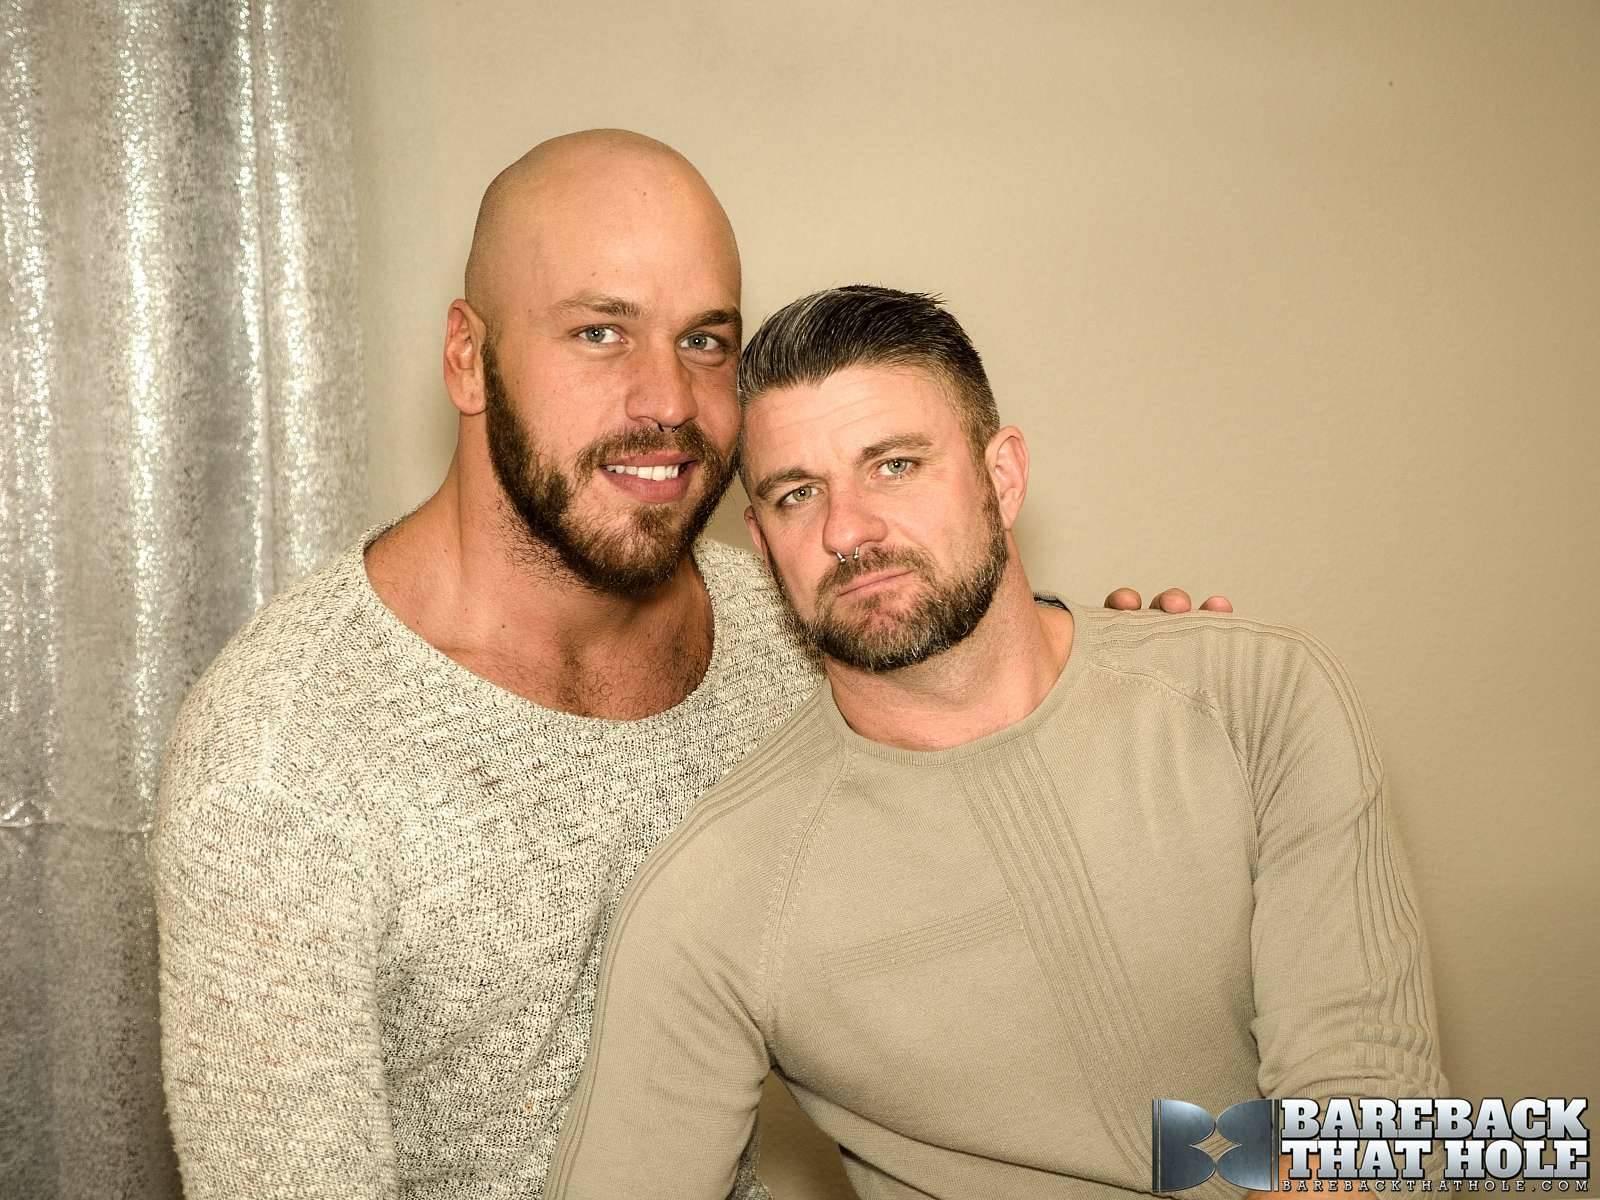 Parker Logan and Christian Matthews Gay Bareback